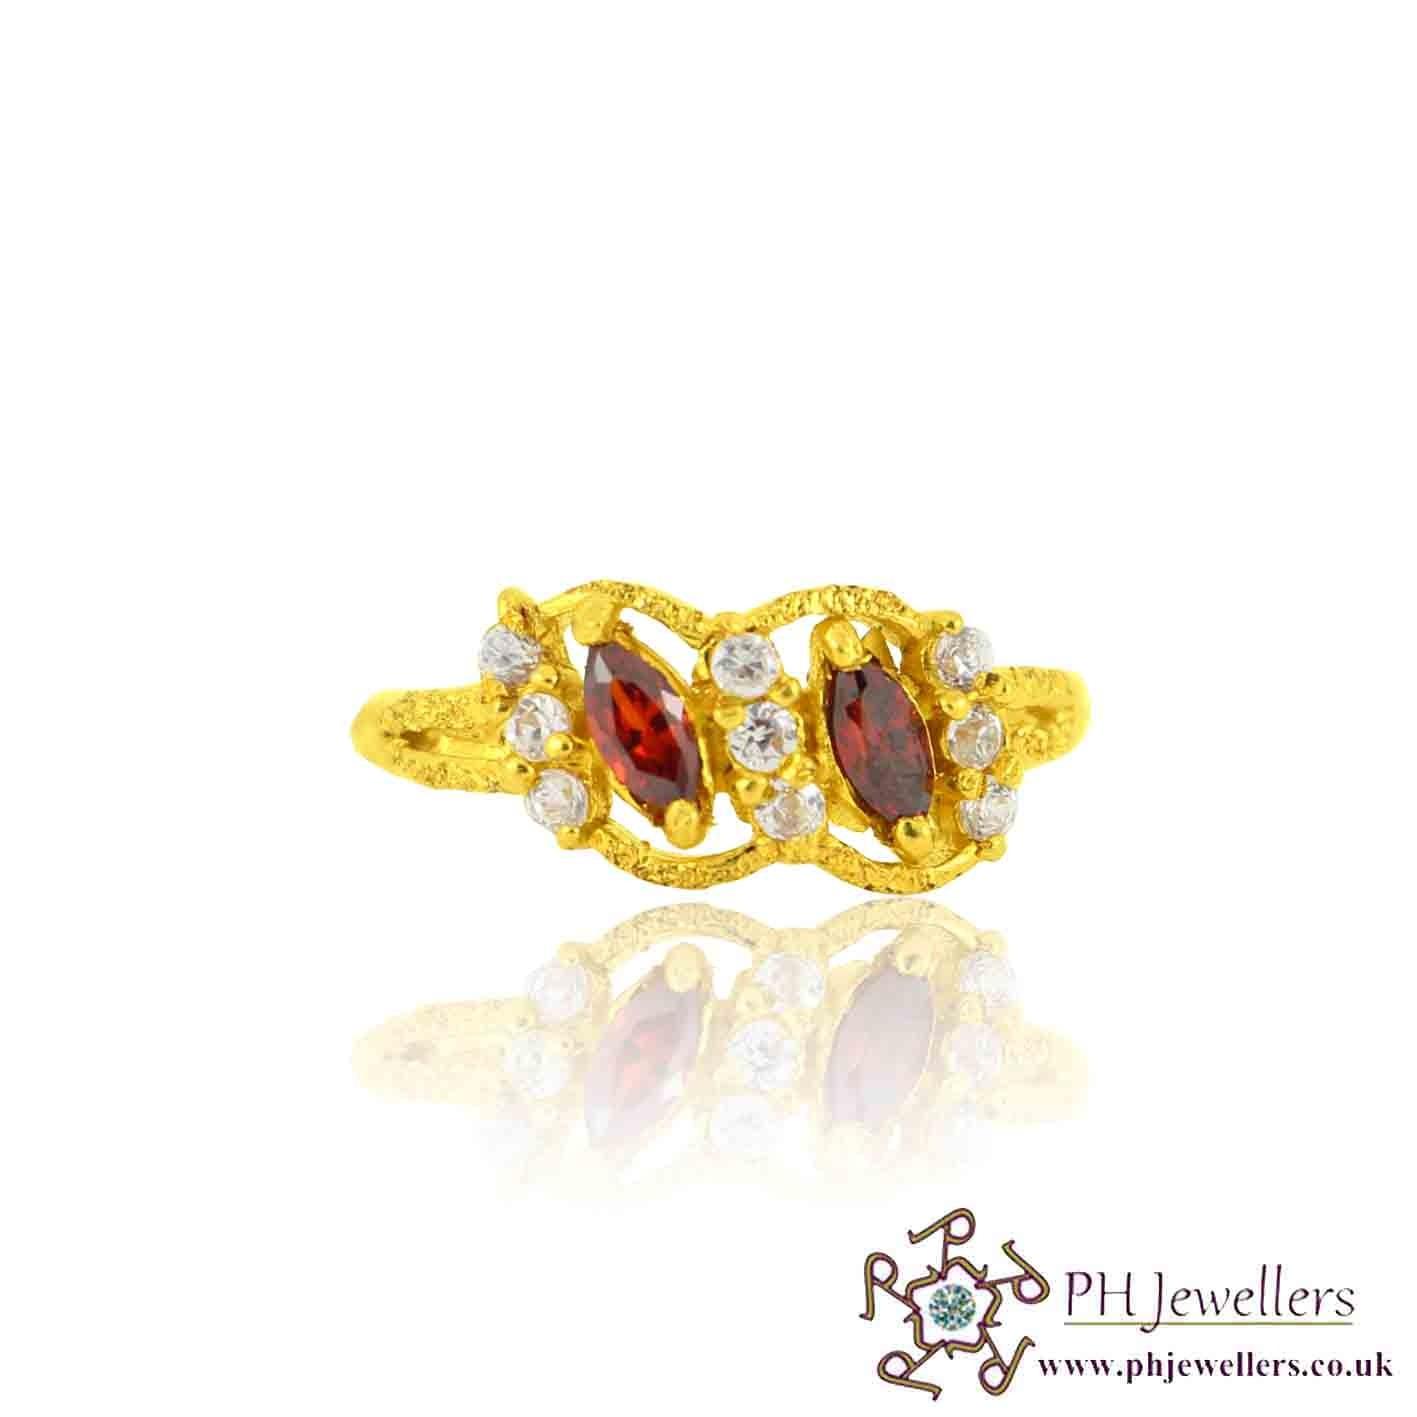 22ct 916 Yellow Gold Hallmark  Garnet Ring CZ Size M 1/2 SR126